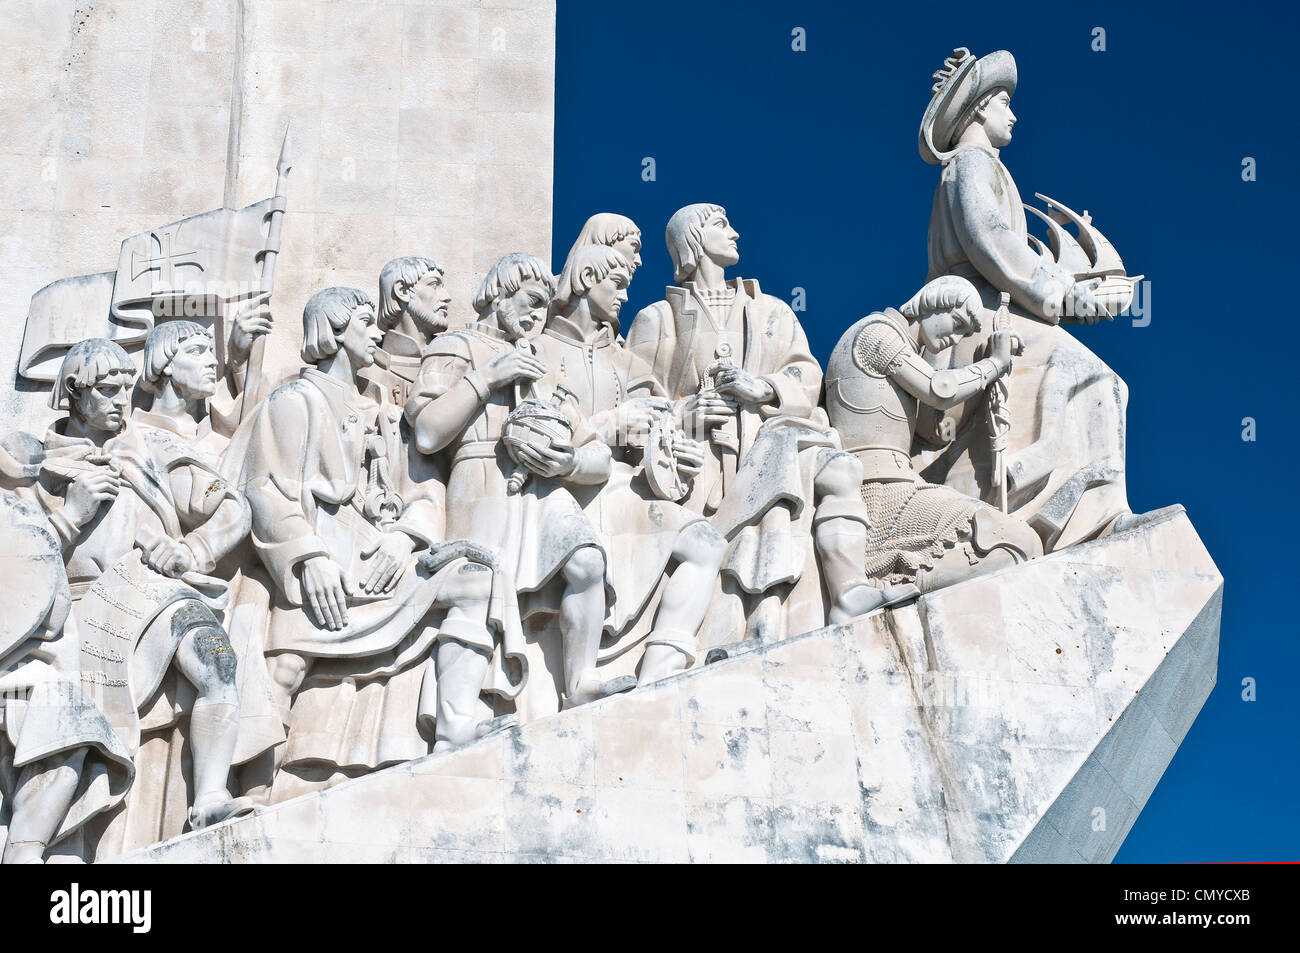 Detail of the Padrão dos Descobrimentos or Monument to the Discoveries in Belém, Lisbon, Portugal - Stock Image